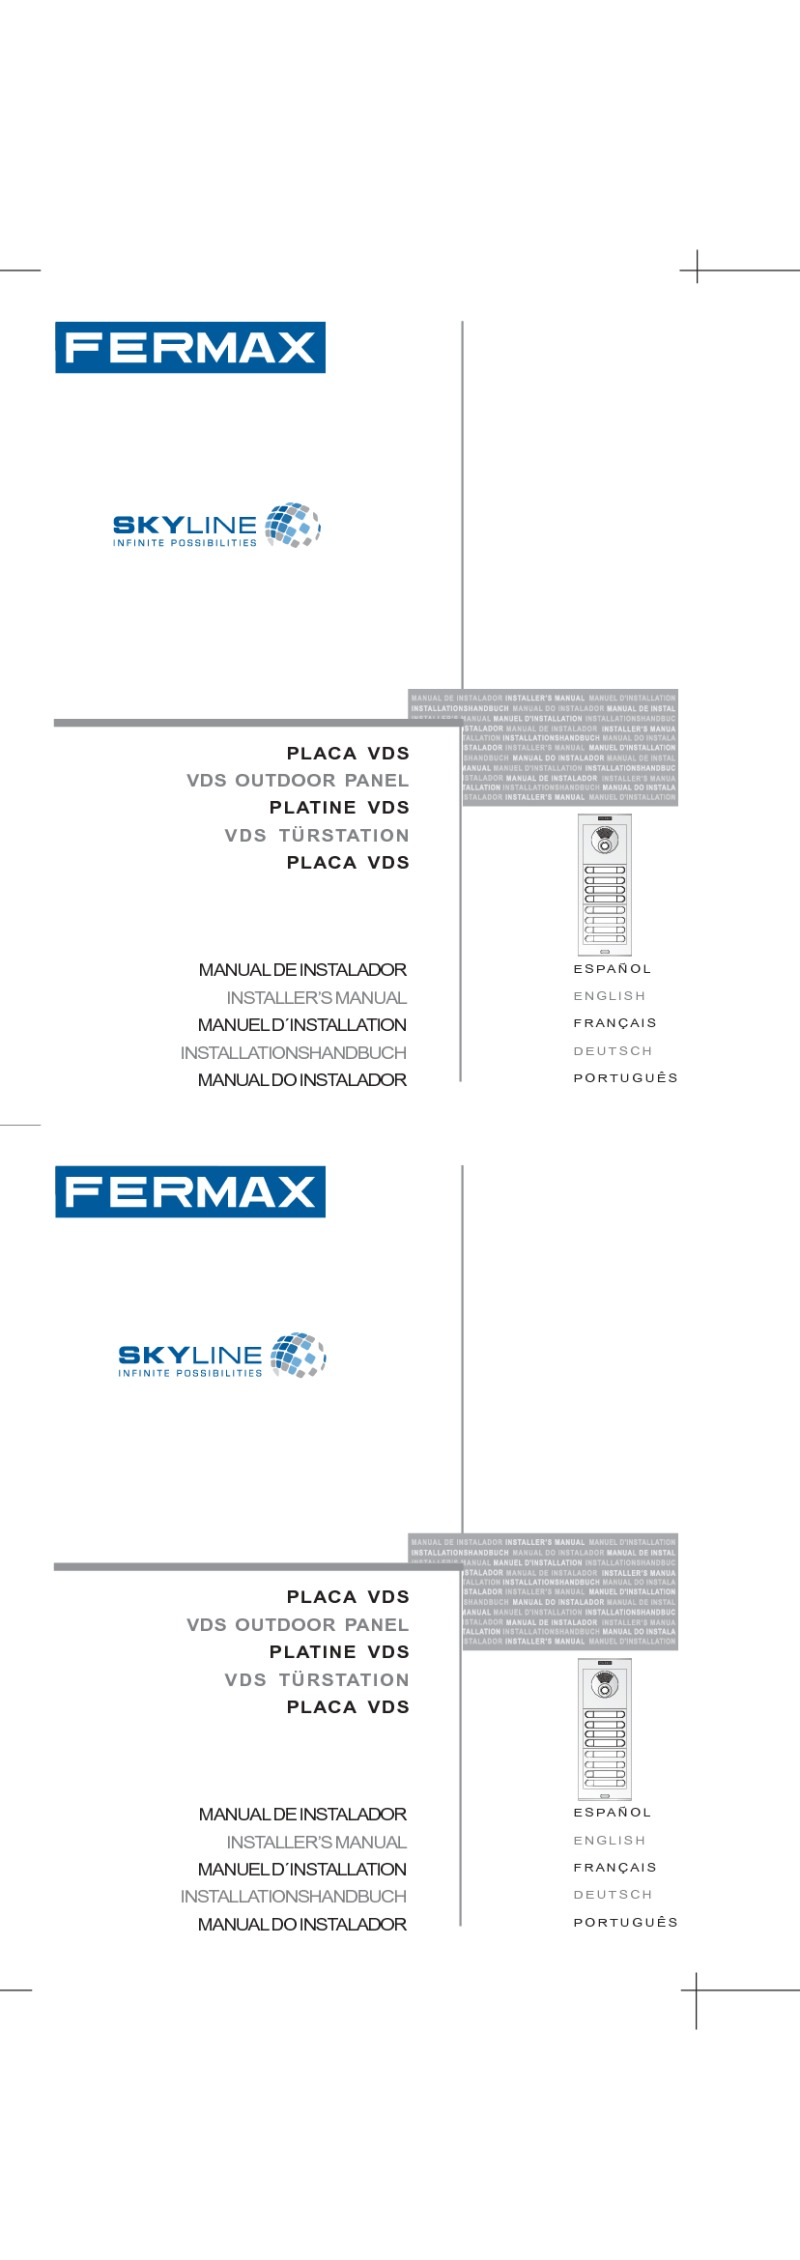 fermax installation instructions rh doorentrydirect com Wiring- Diagram Wire Money